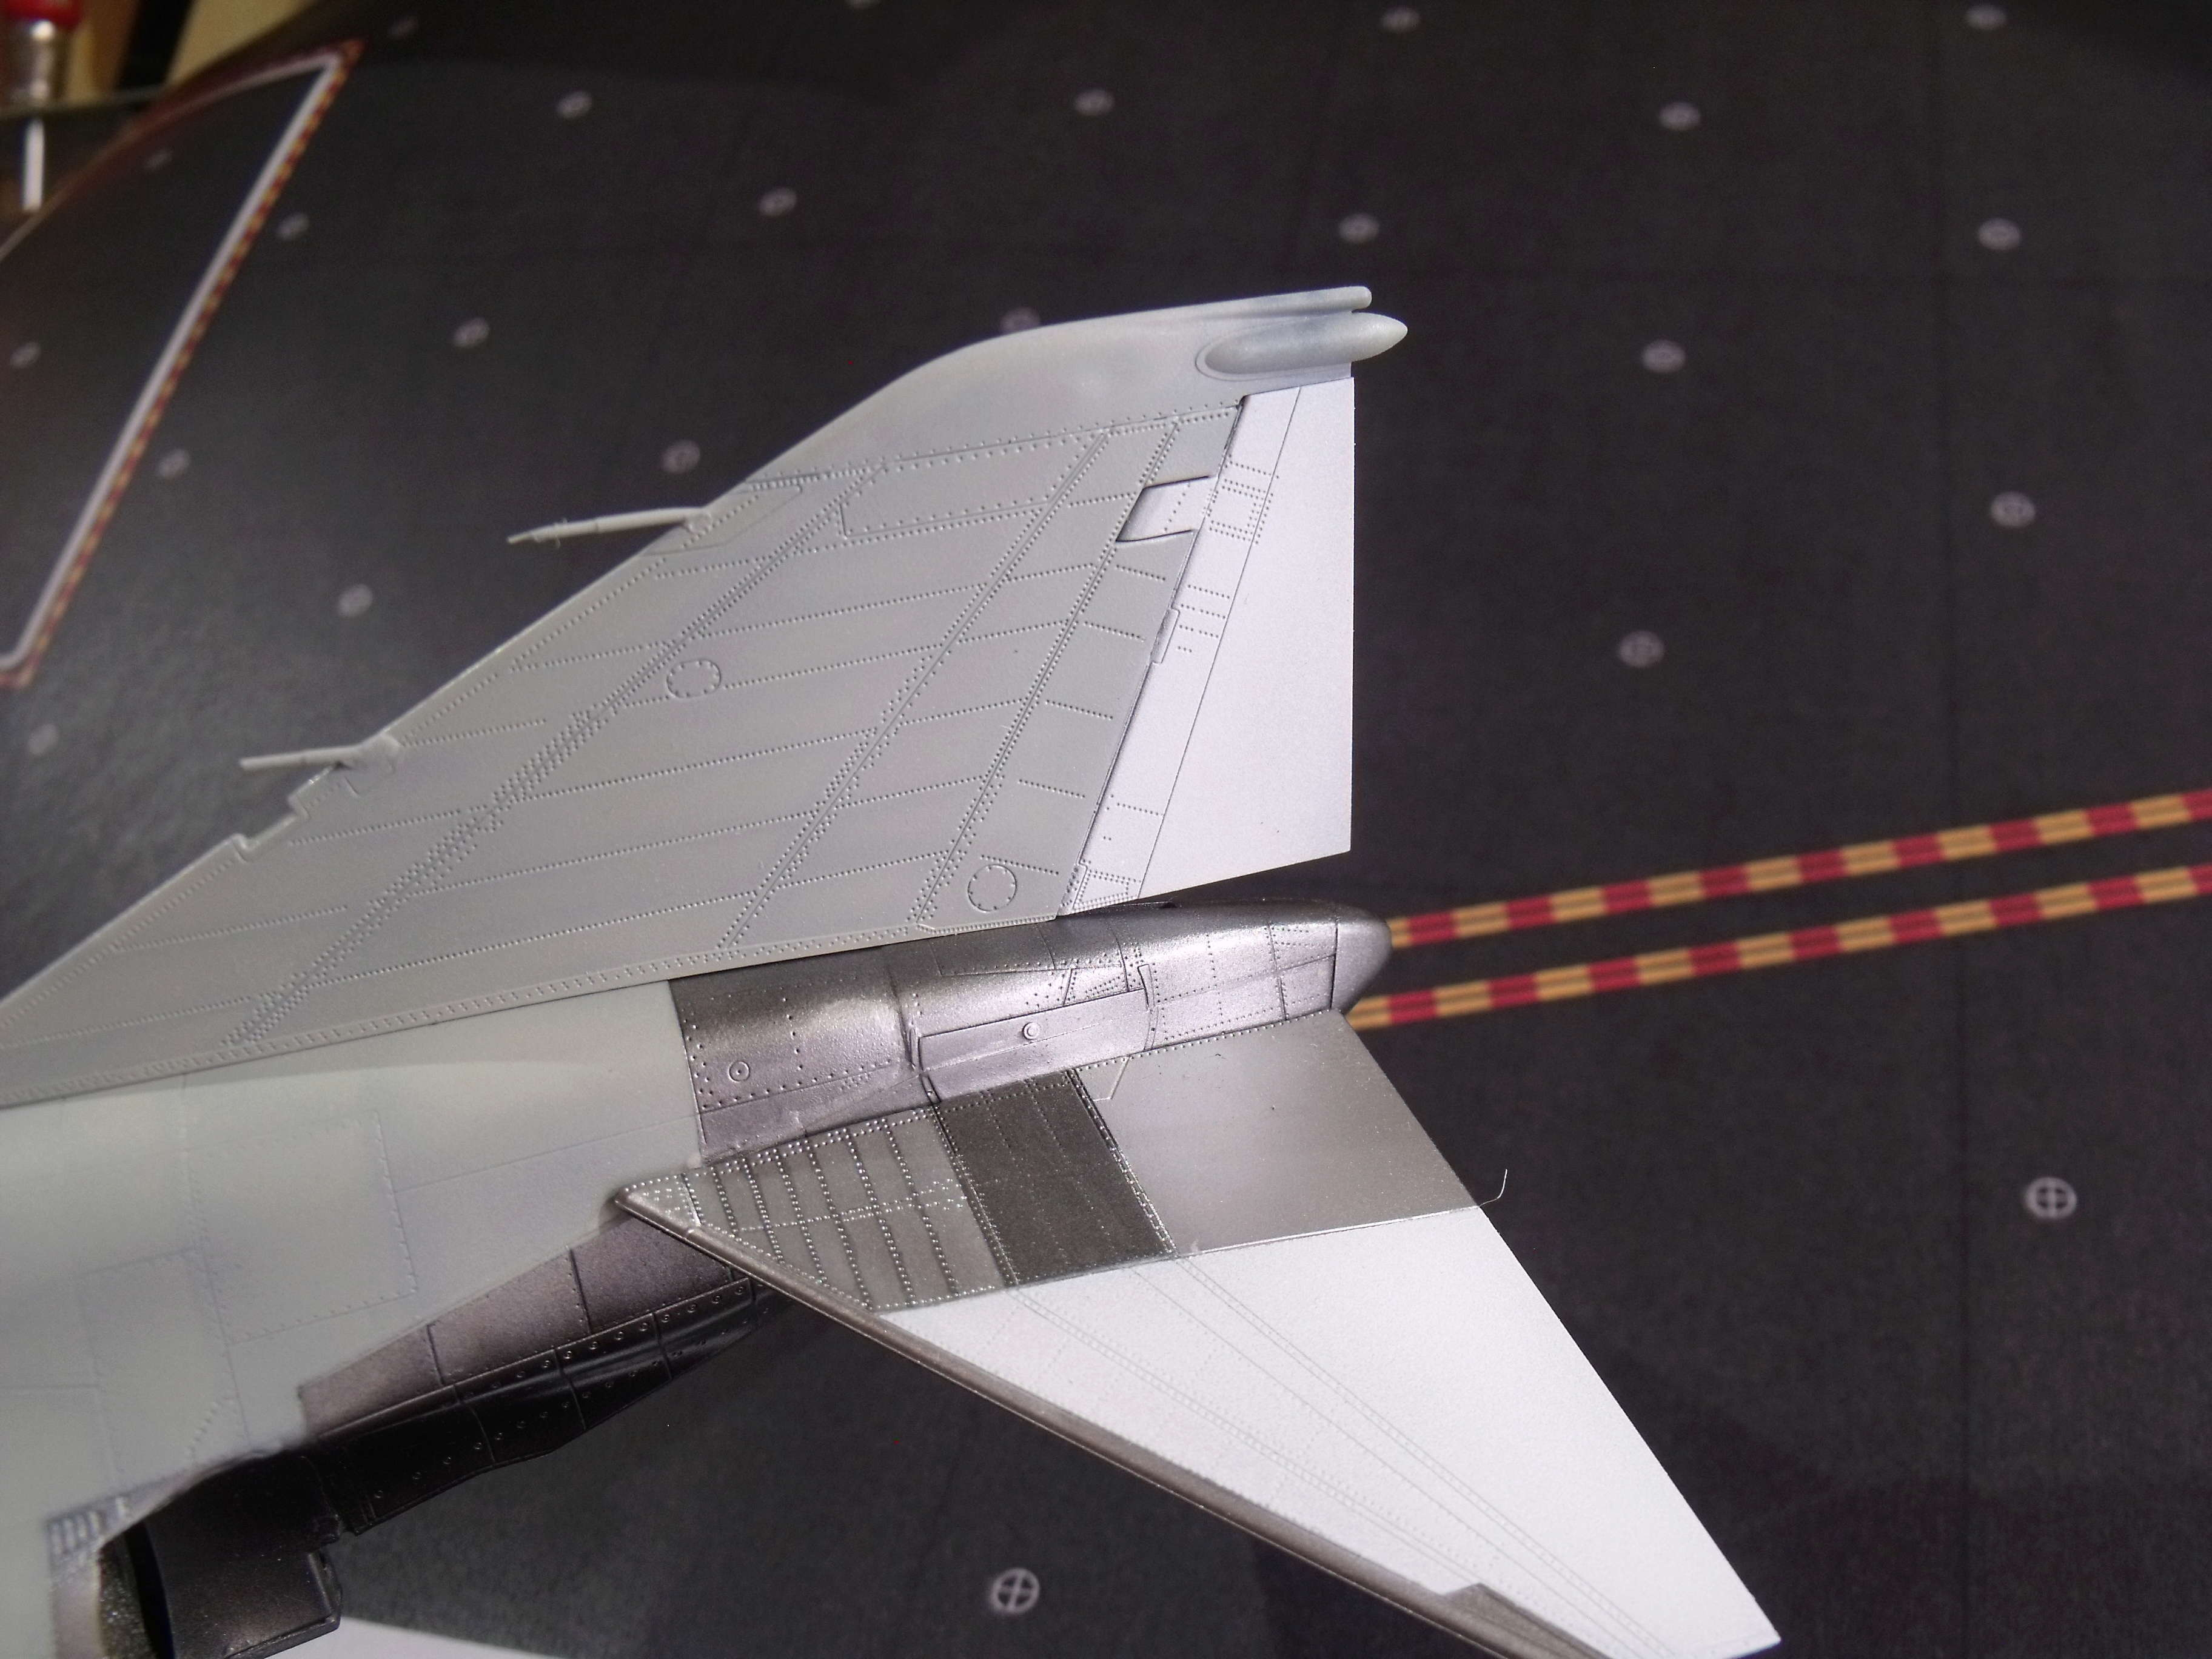 F-4 B Phantom 1/48° - VF-51 - 1972 - Début de patine. - Page 4 Dscf7135